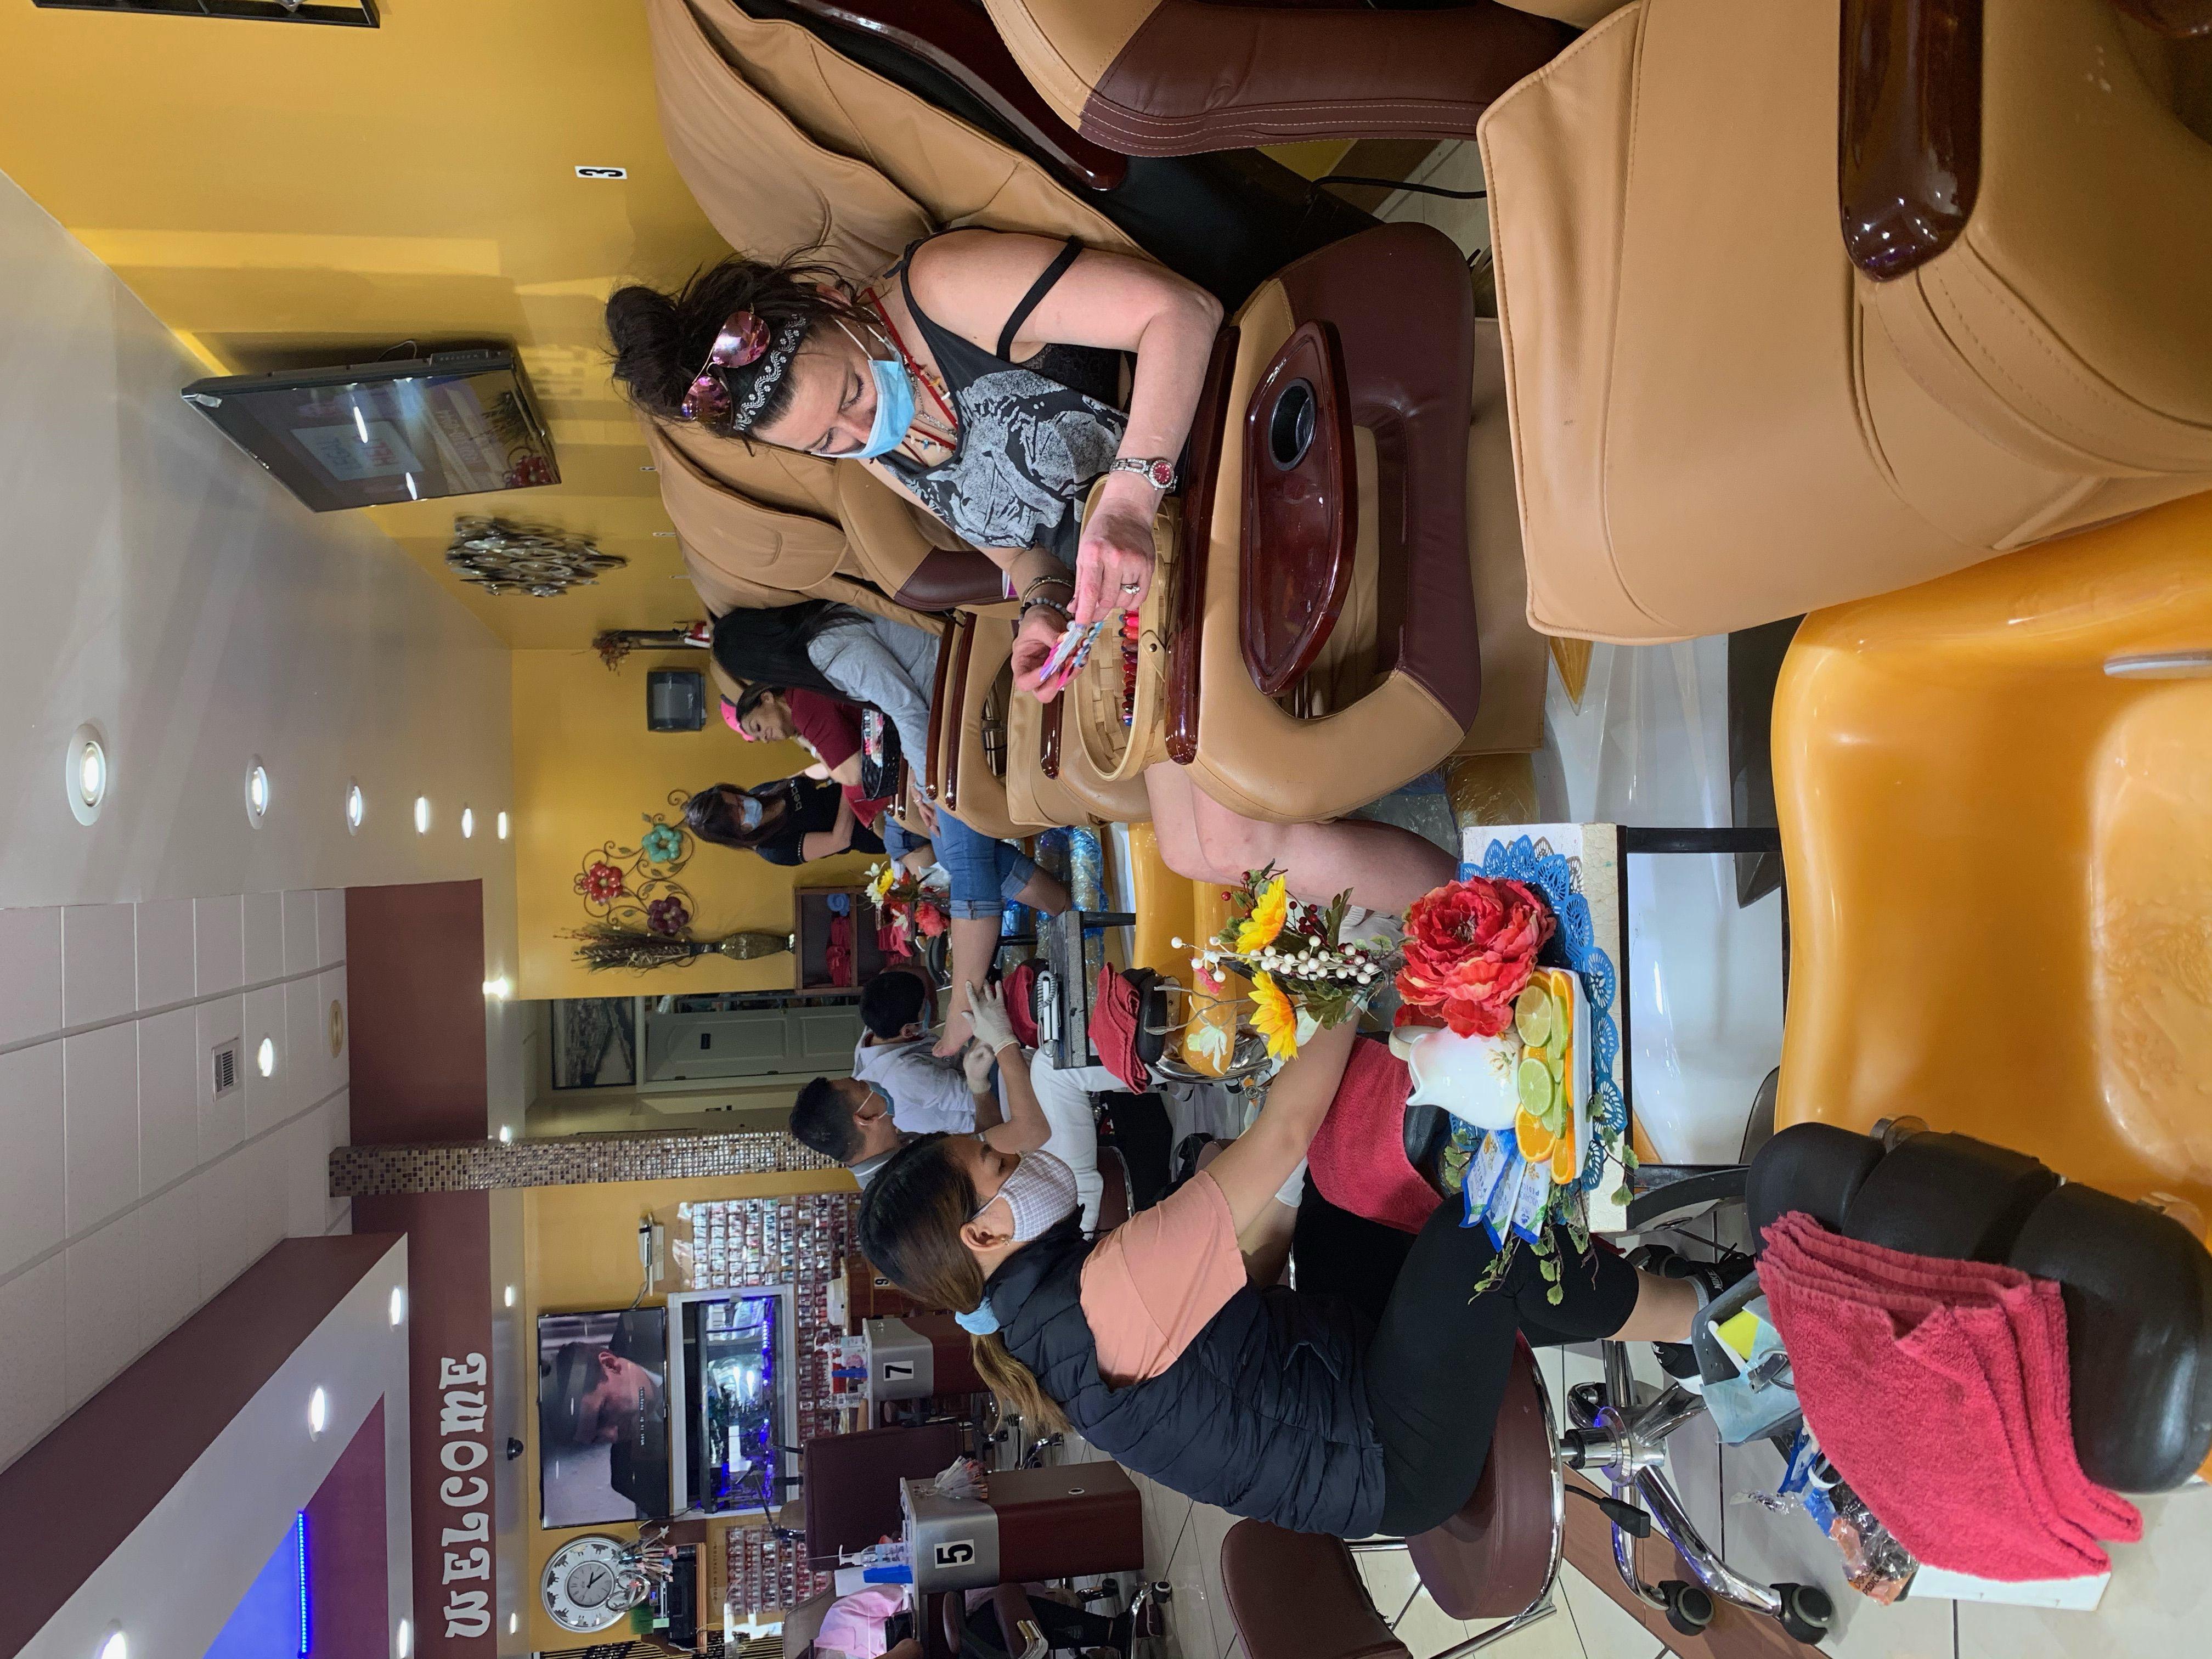 Avalon Nails & Spa   Nail salon 79701   Midland, TX